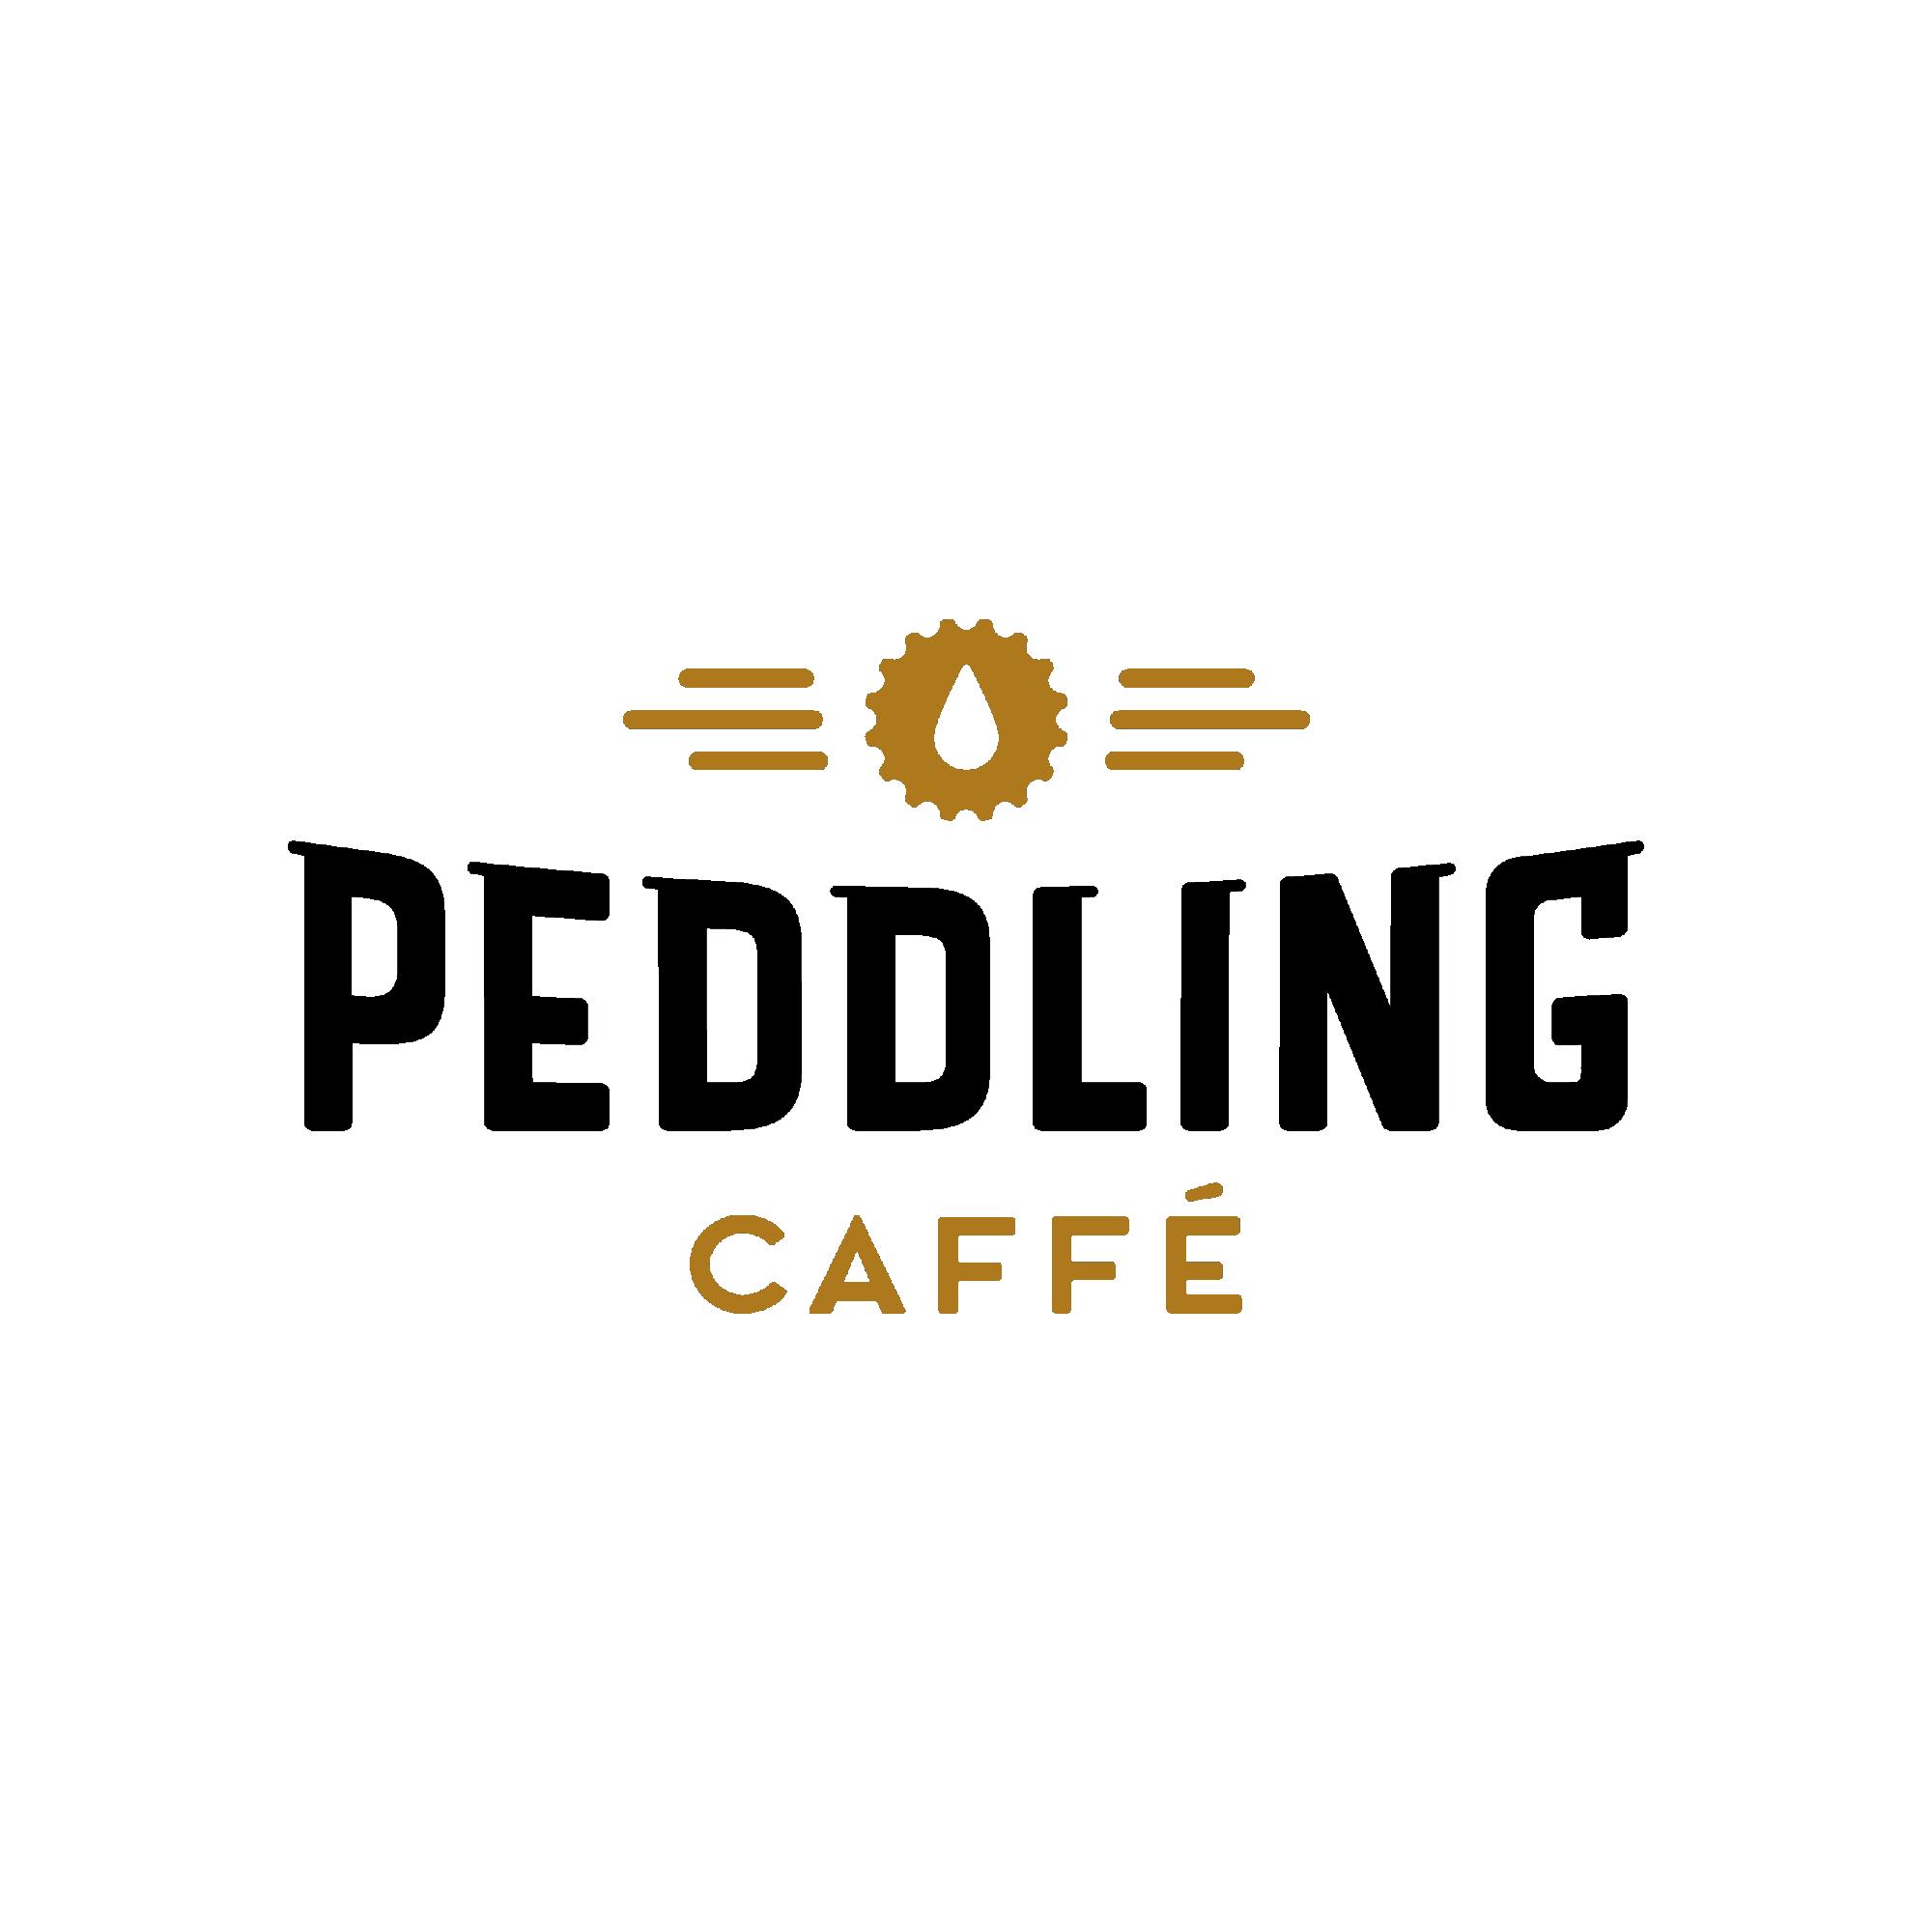 peddlingcaffe.png